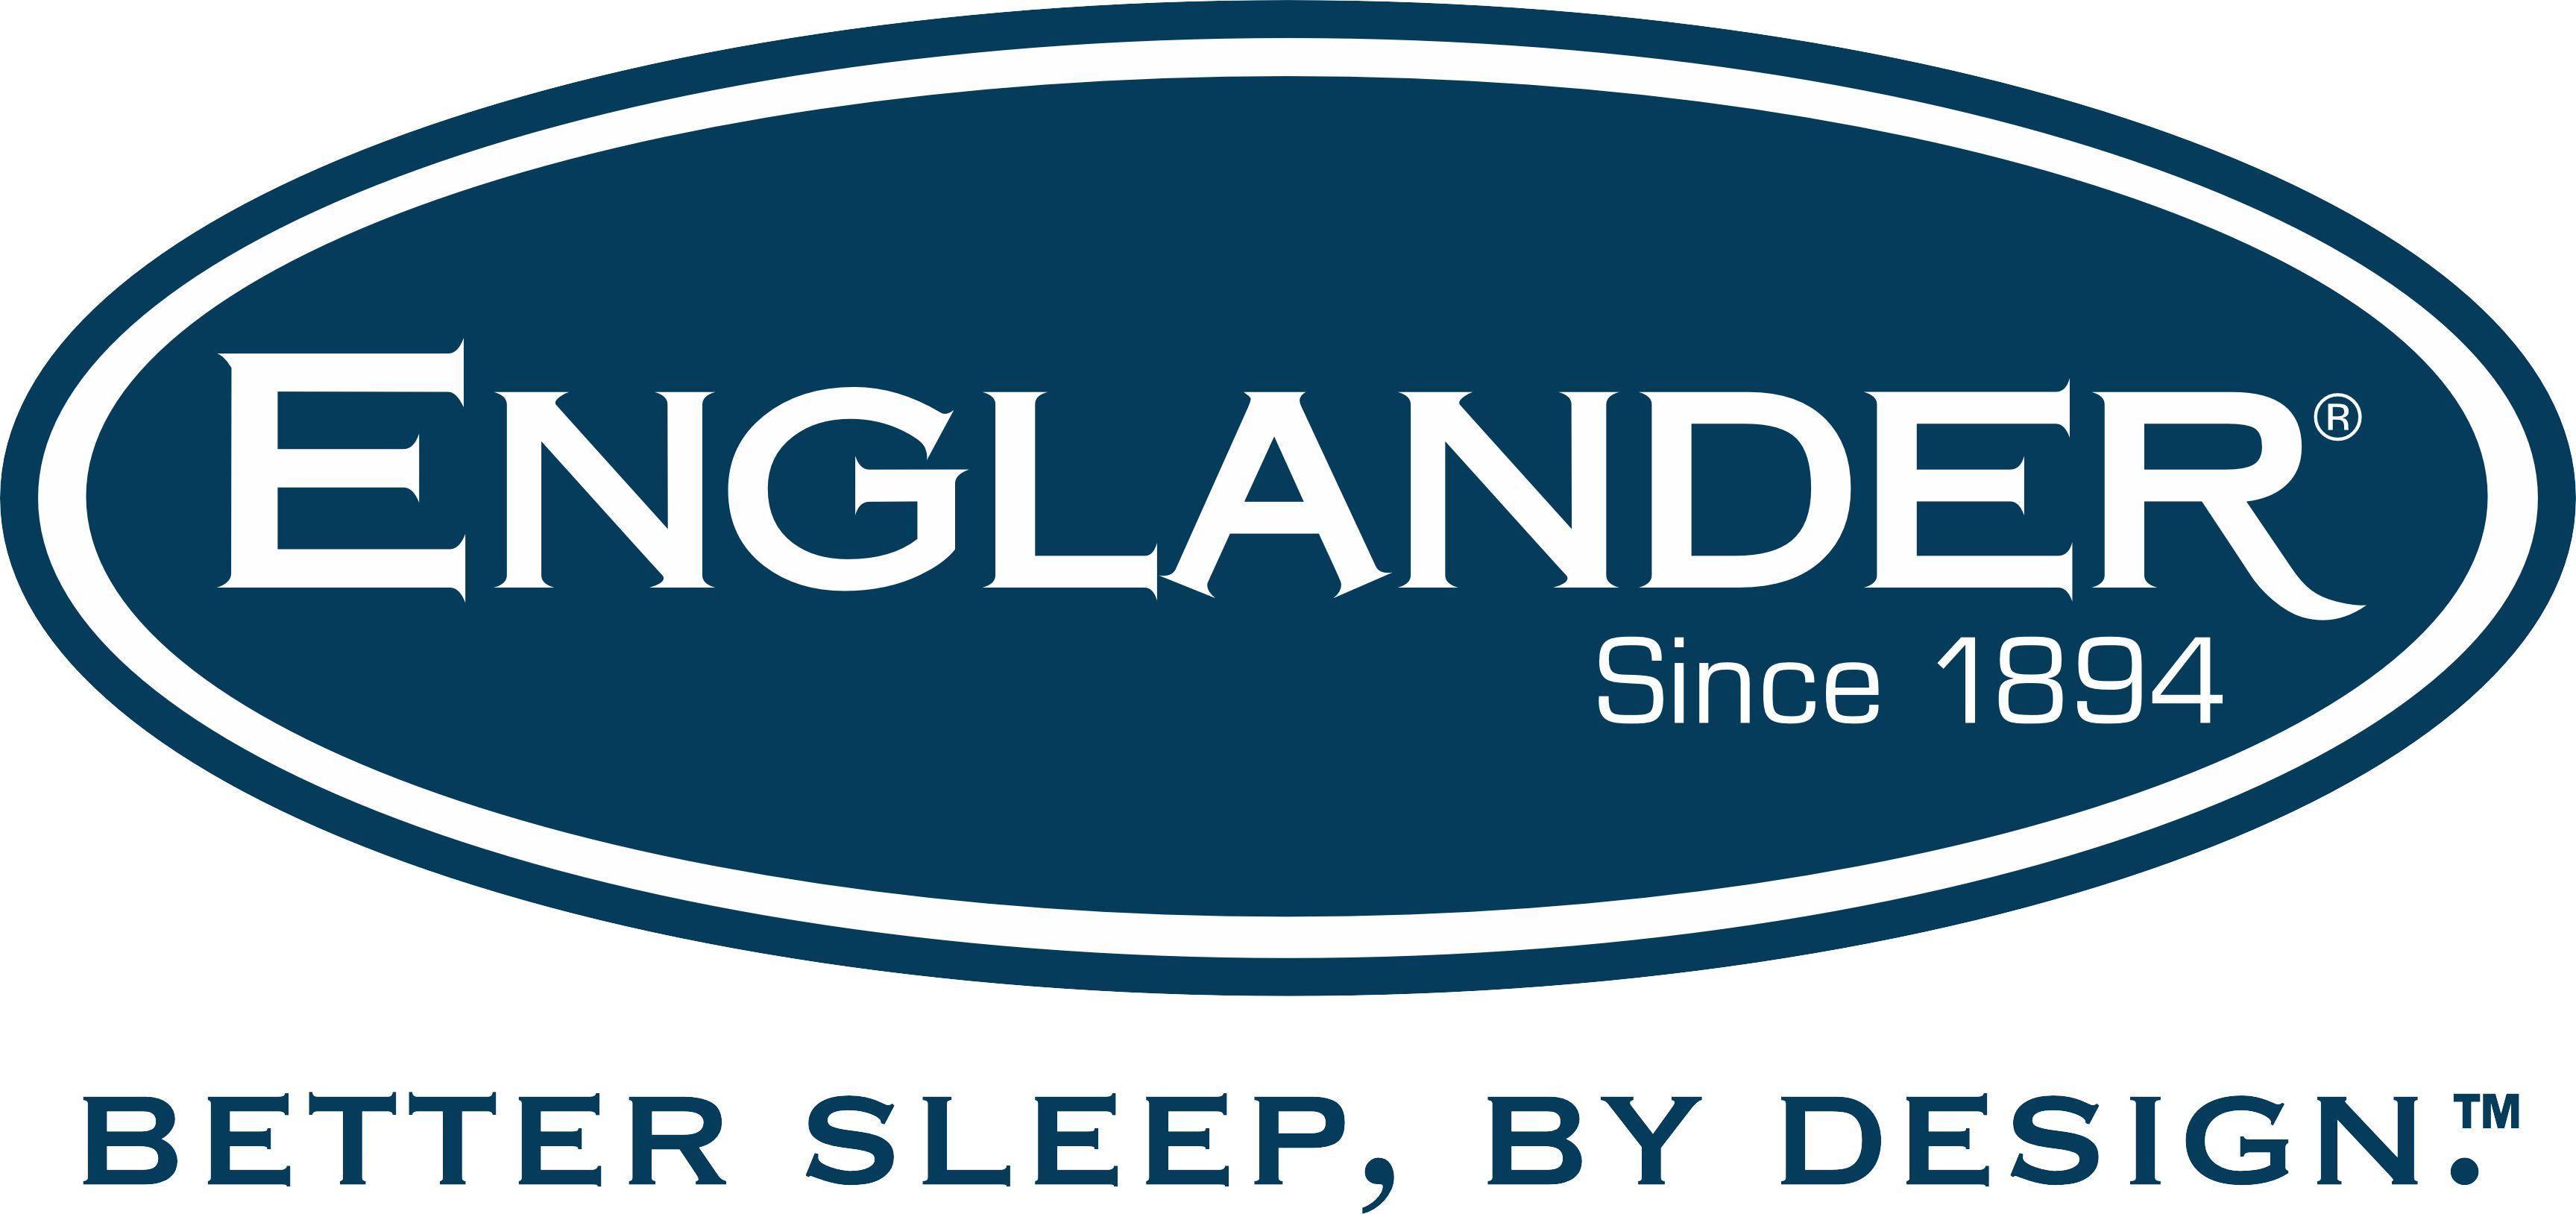 Pin By Custom Fundraising Solutions On Products Englander Mattress Mattress Companies Better Sleep